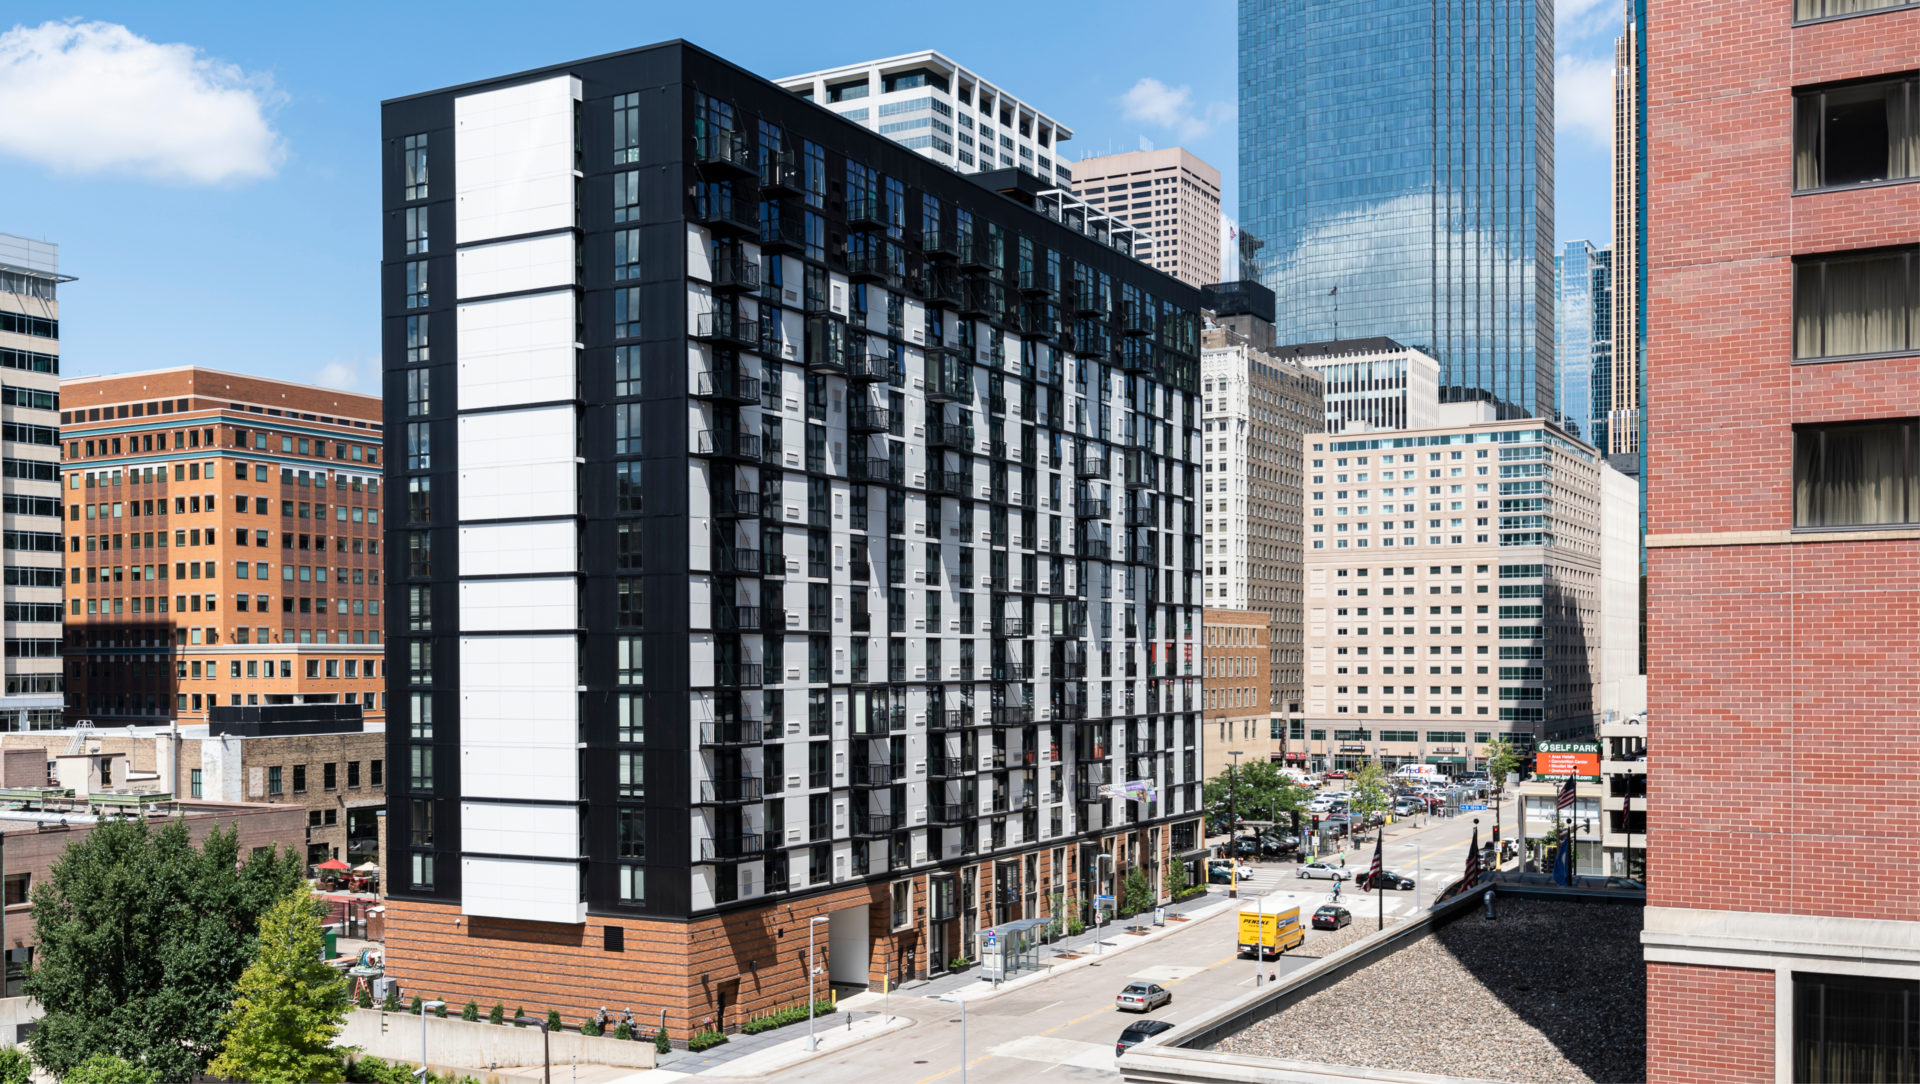 City Club Apartments - CBD Minneapolis - BKV Group - High-Rise